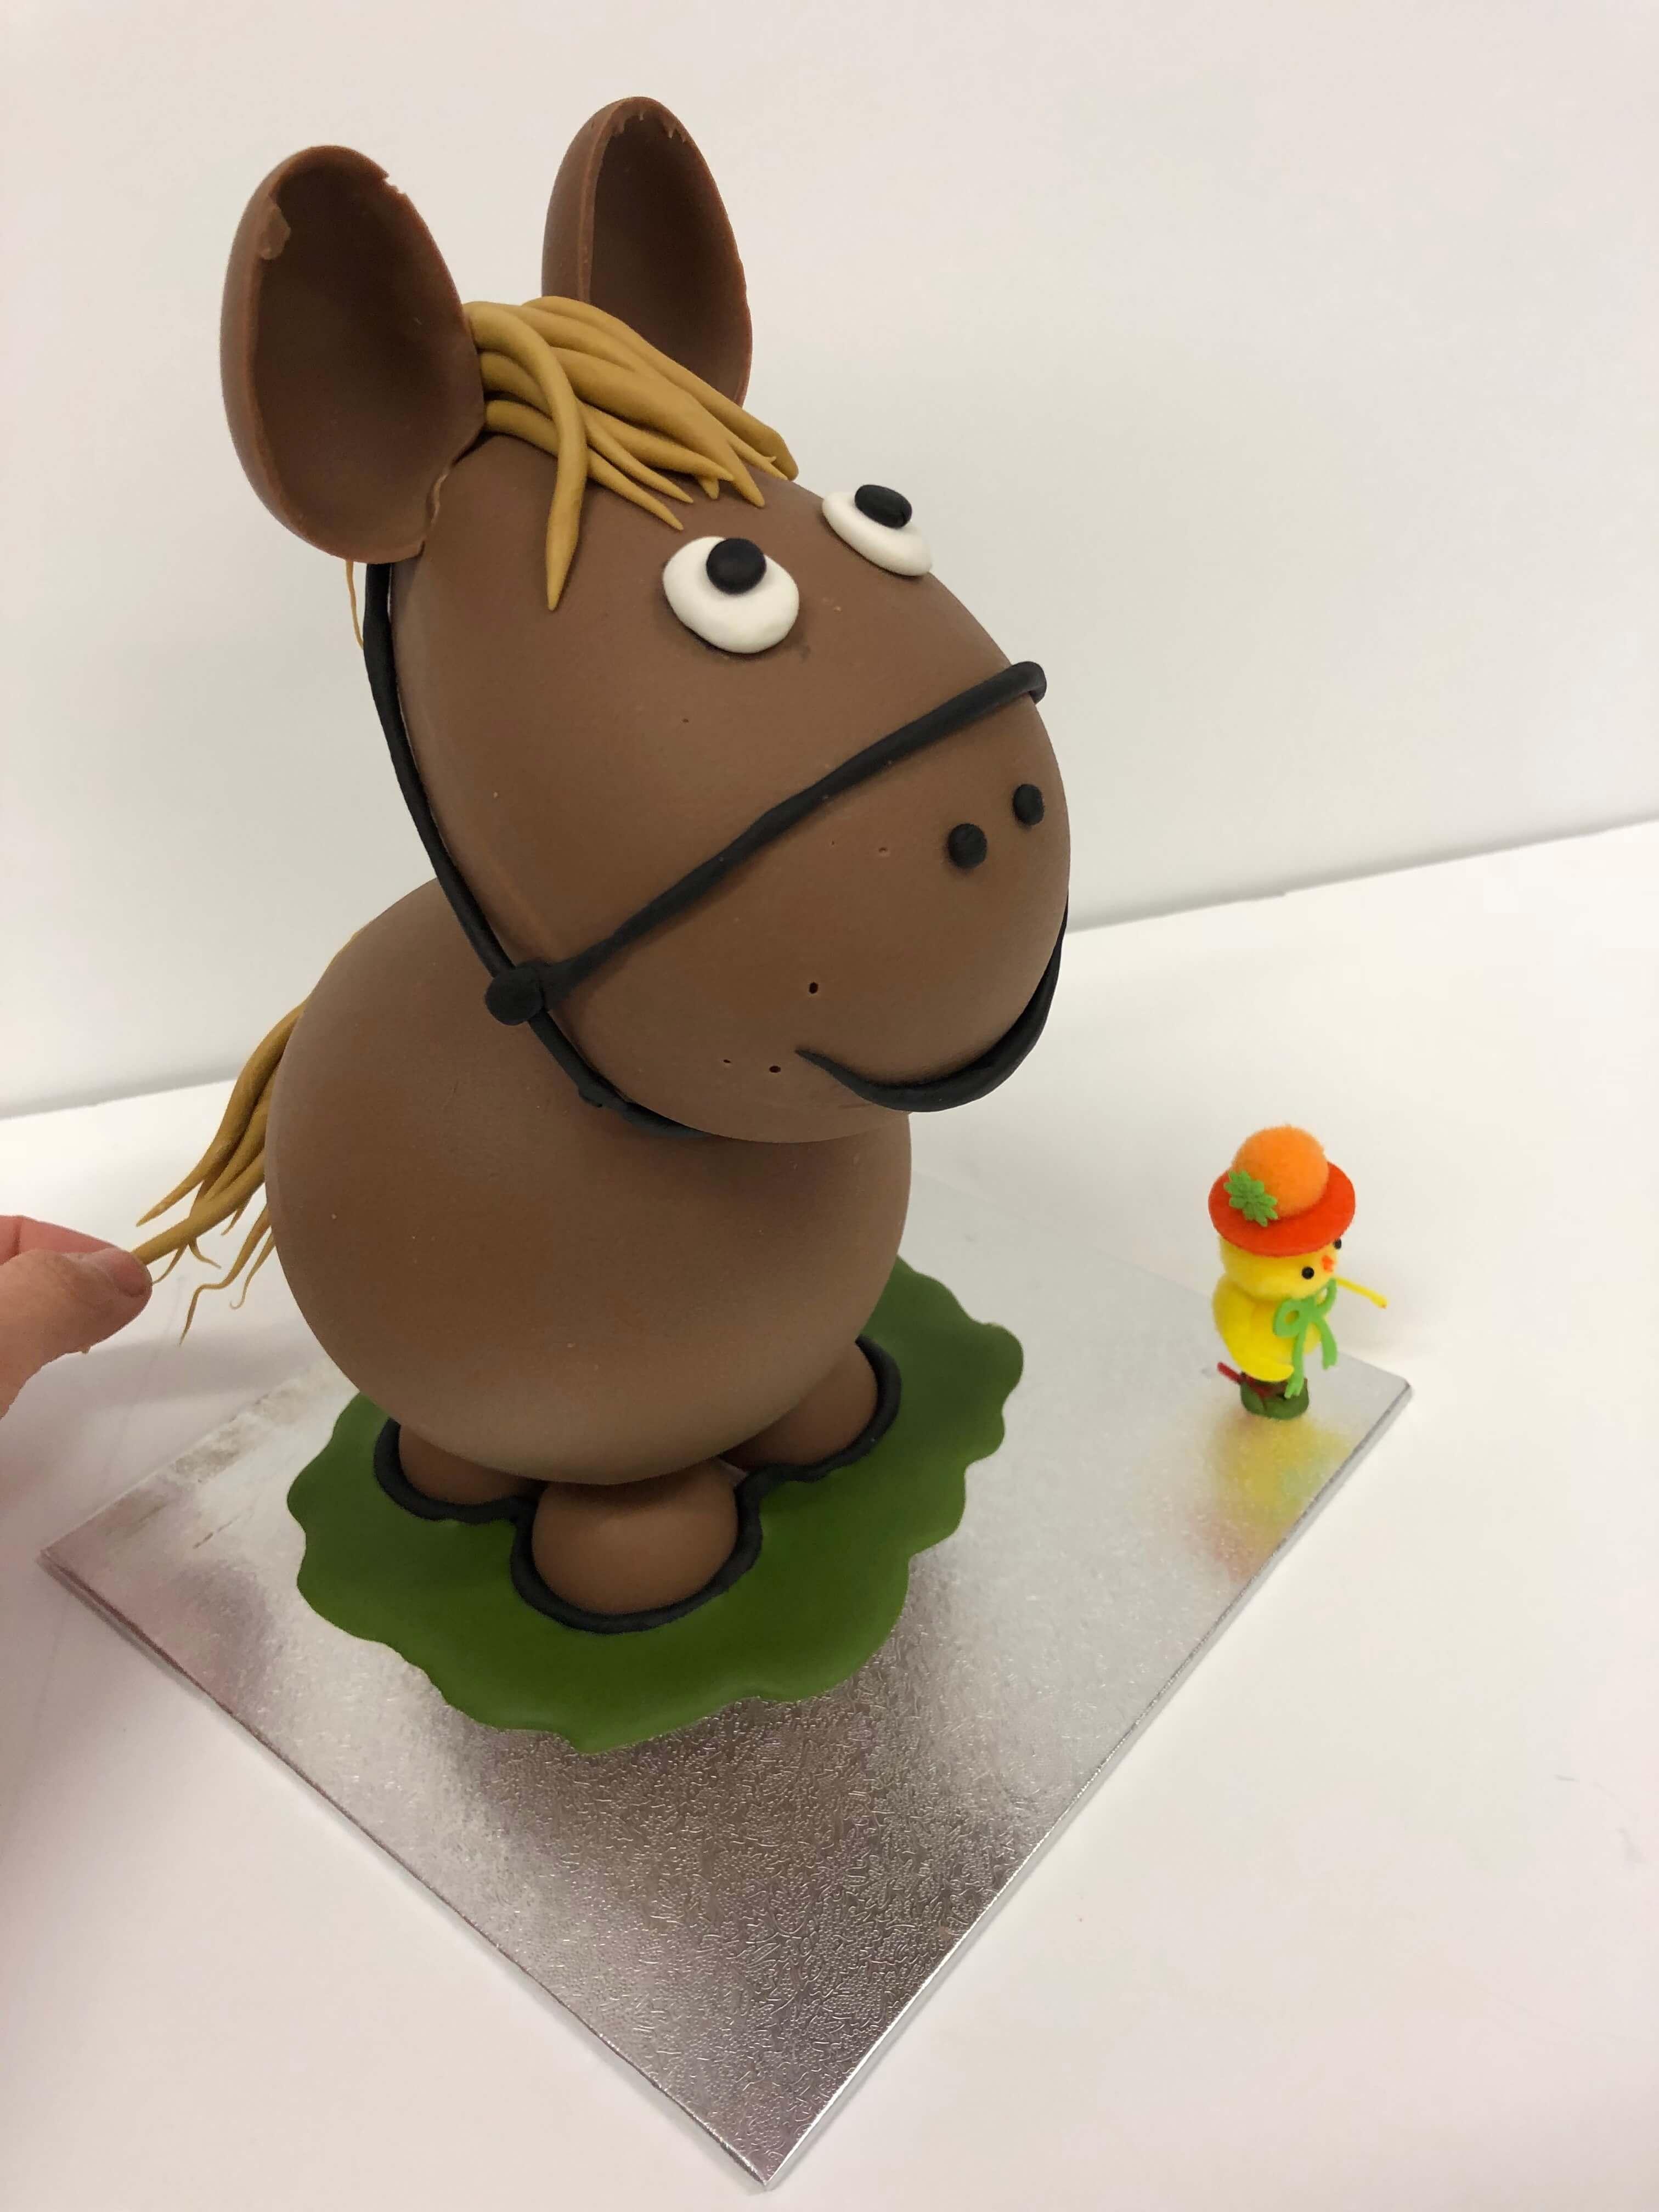 figura de pascua huevo de pascua chocolate caballo